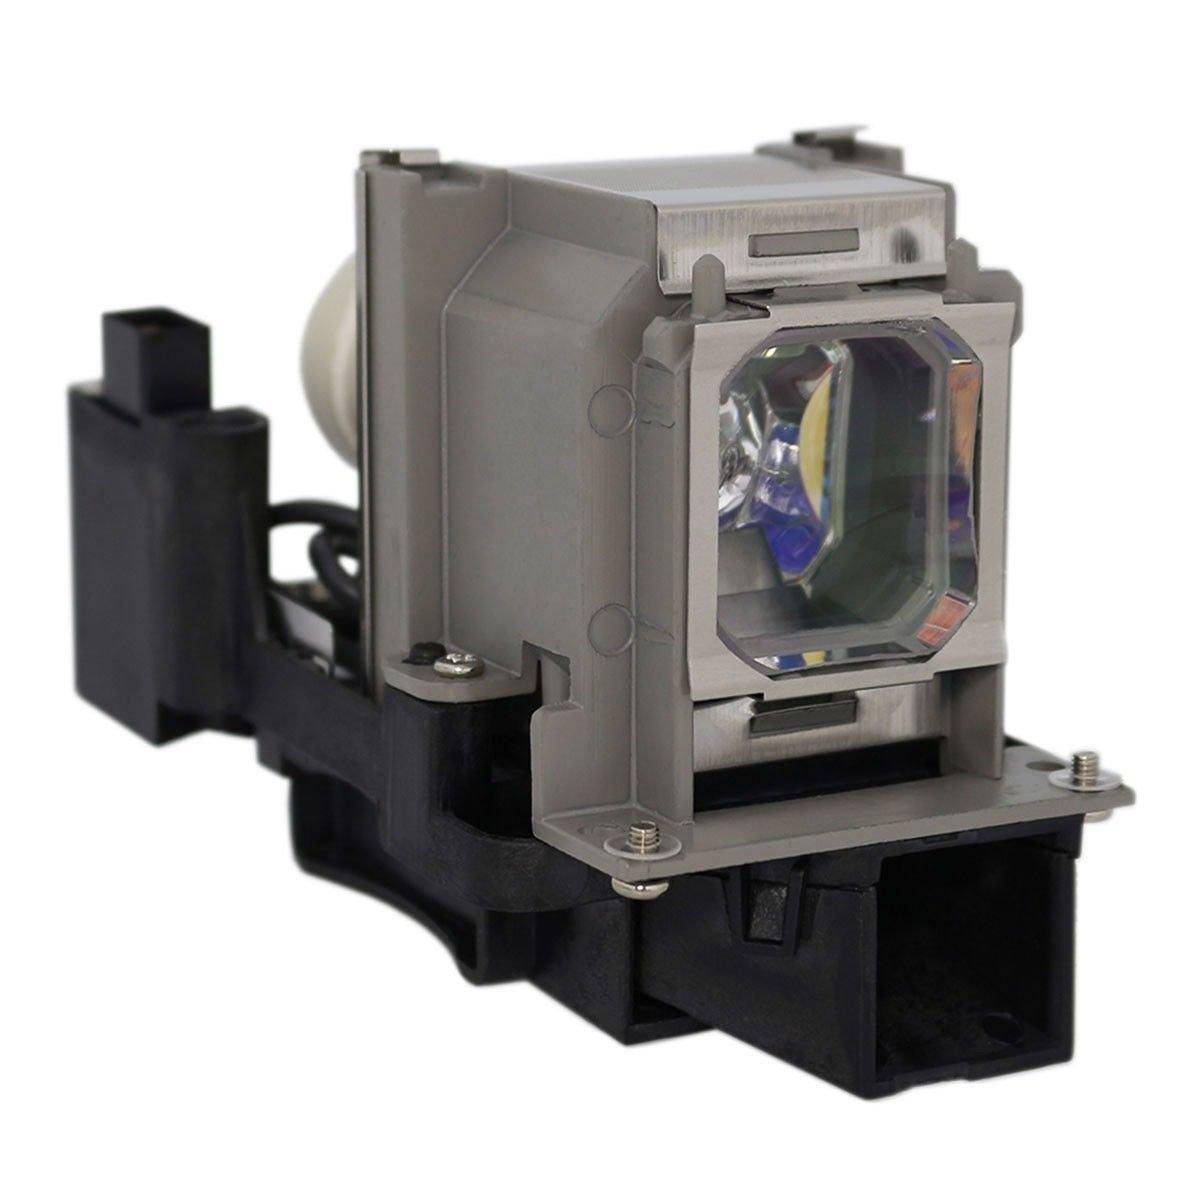 Supermait LMP-C250 プロジェクター交換用ランプ 純正OEMバルブ + 汎用ハウジング 180日間安心保証つき VPL-CH350 / VPL-CH355 対応   B078MPXTXT